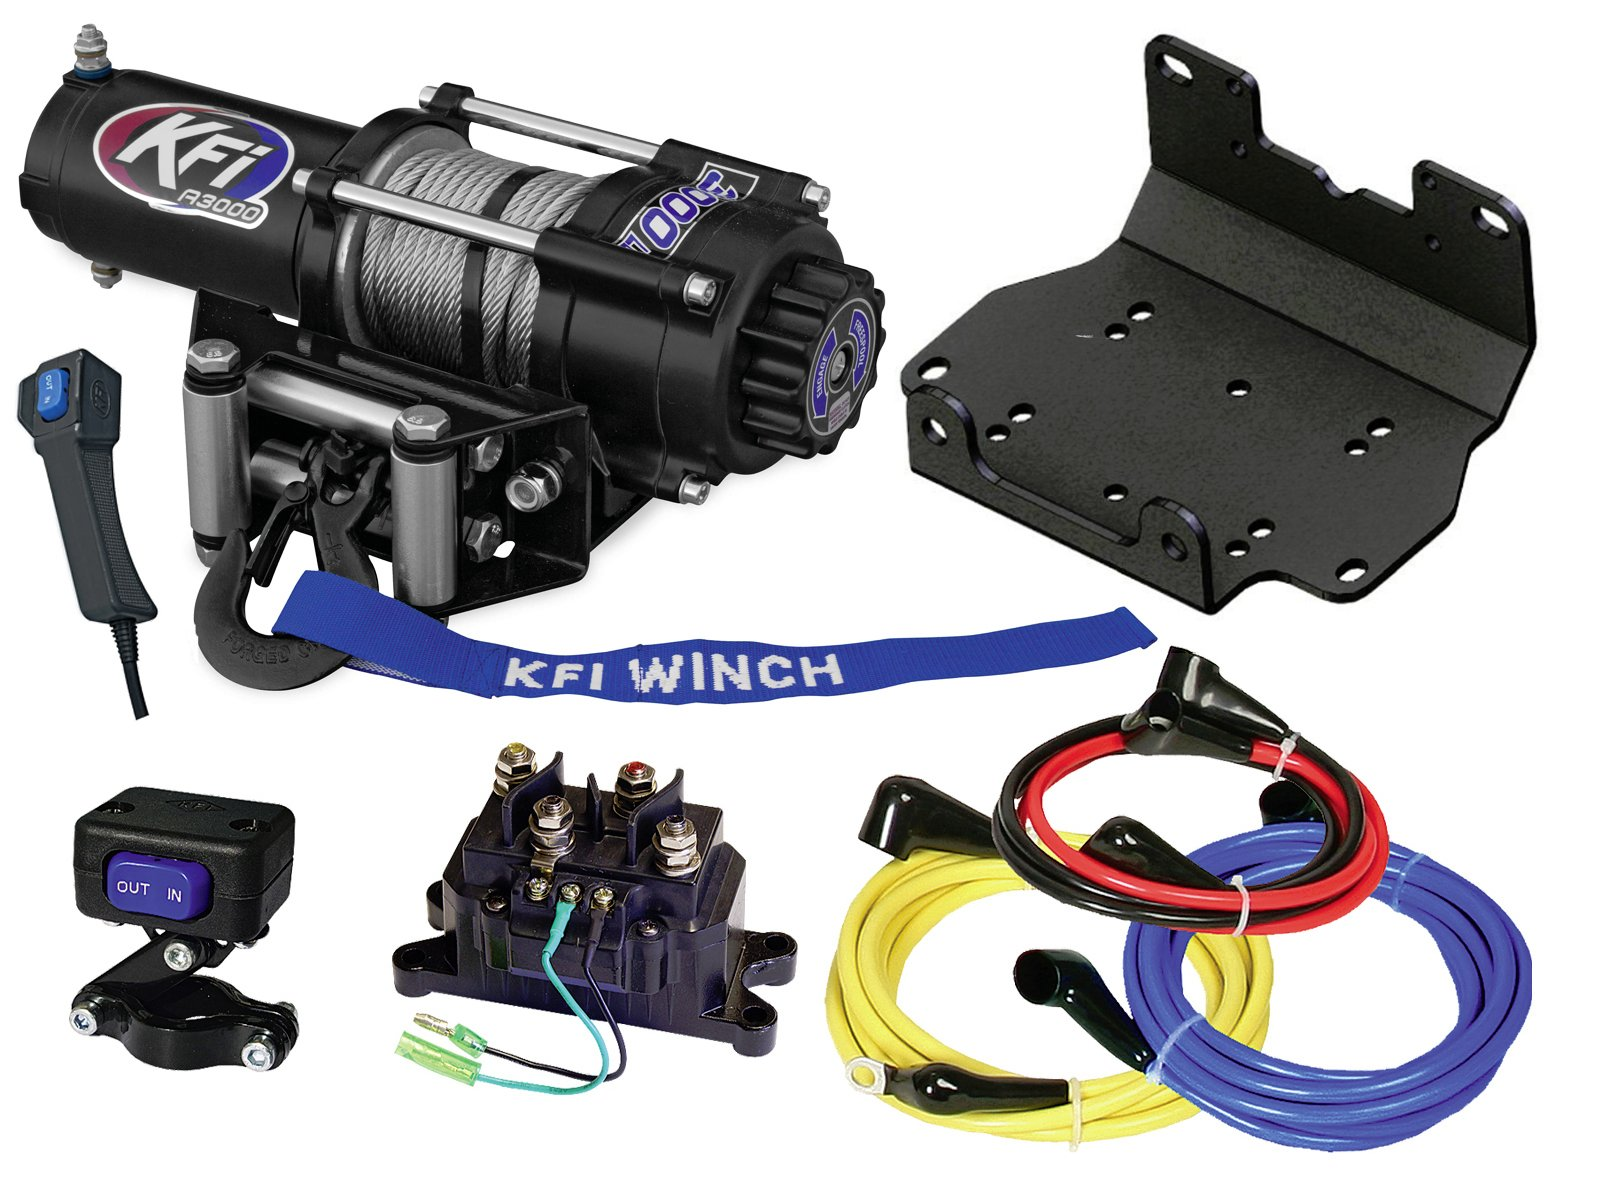 KFI Combo Kit - A3000 3000 lb Winch & Winch Mount - compatible with 2016-2018 Yamaha Grizzly 700 & 2016-2018 Kodiak 700 ATV